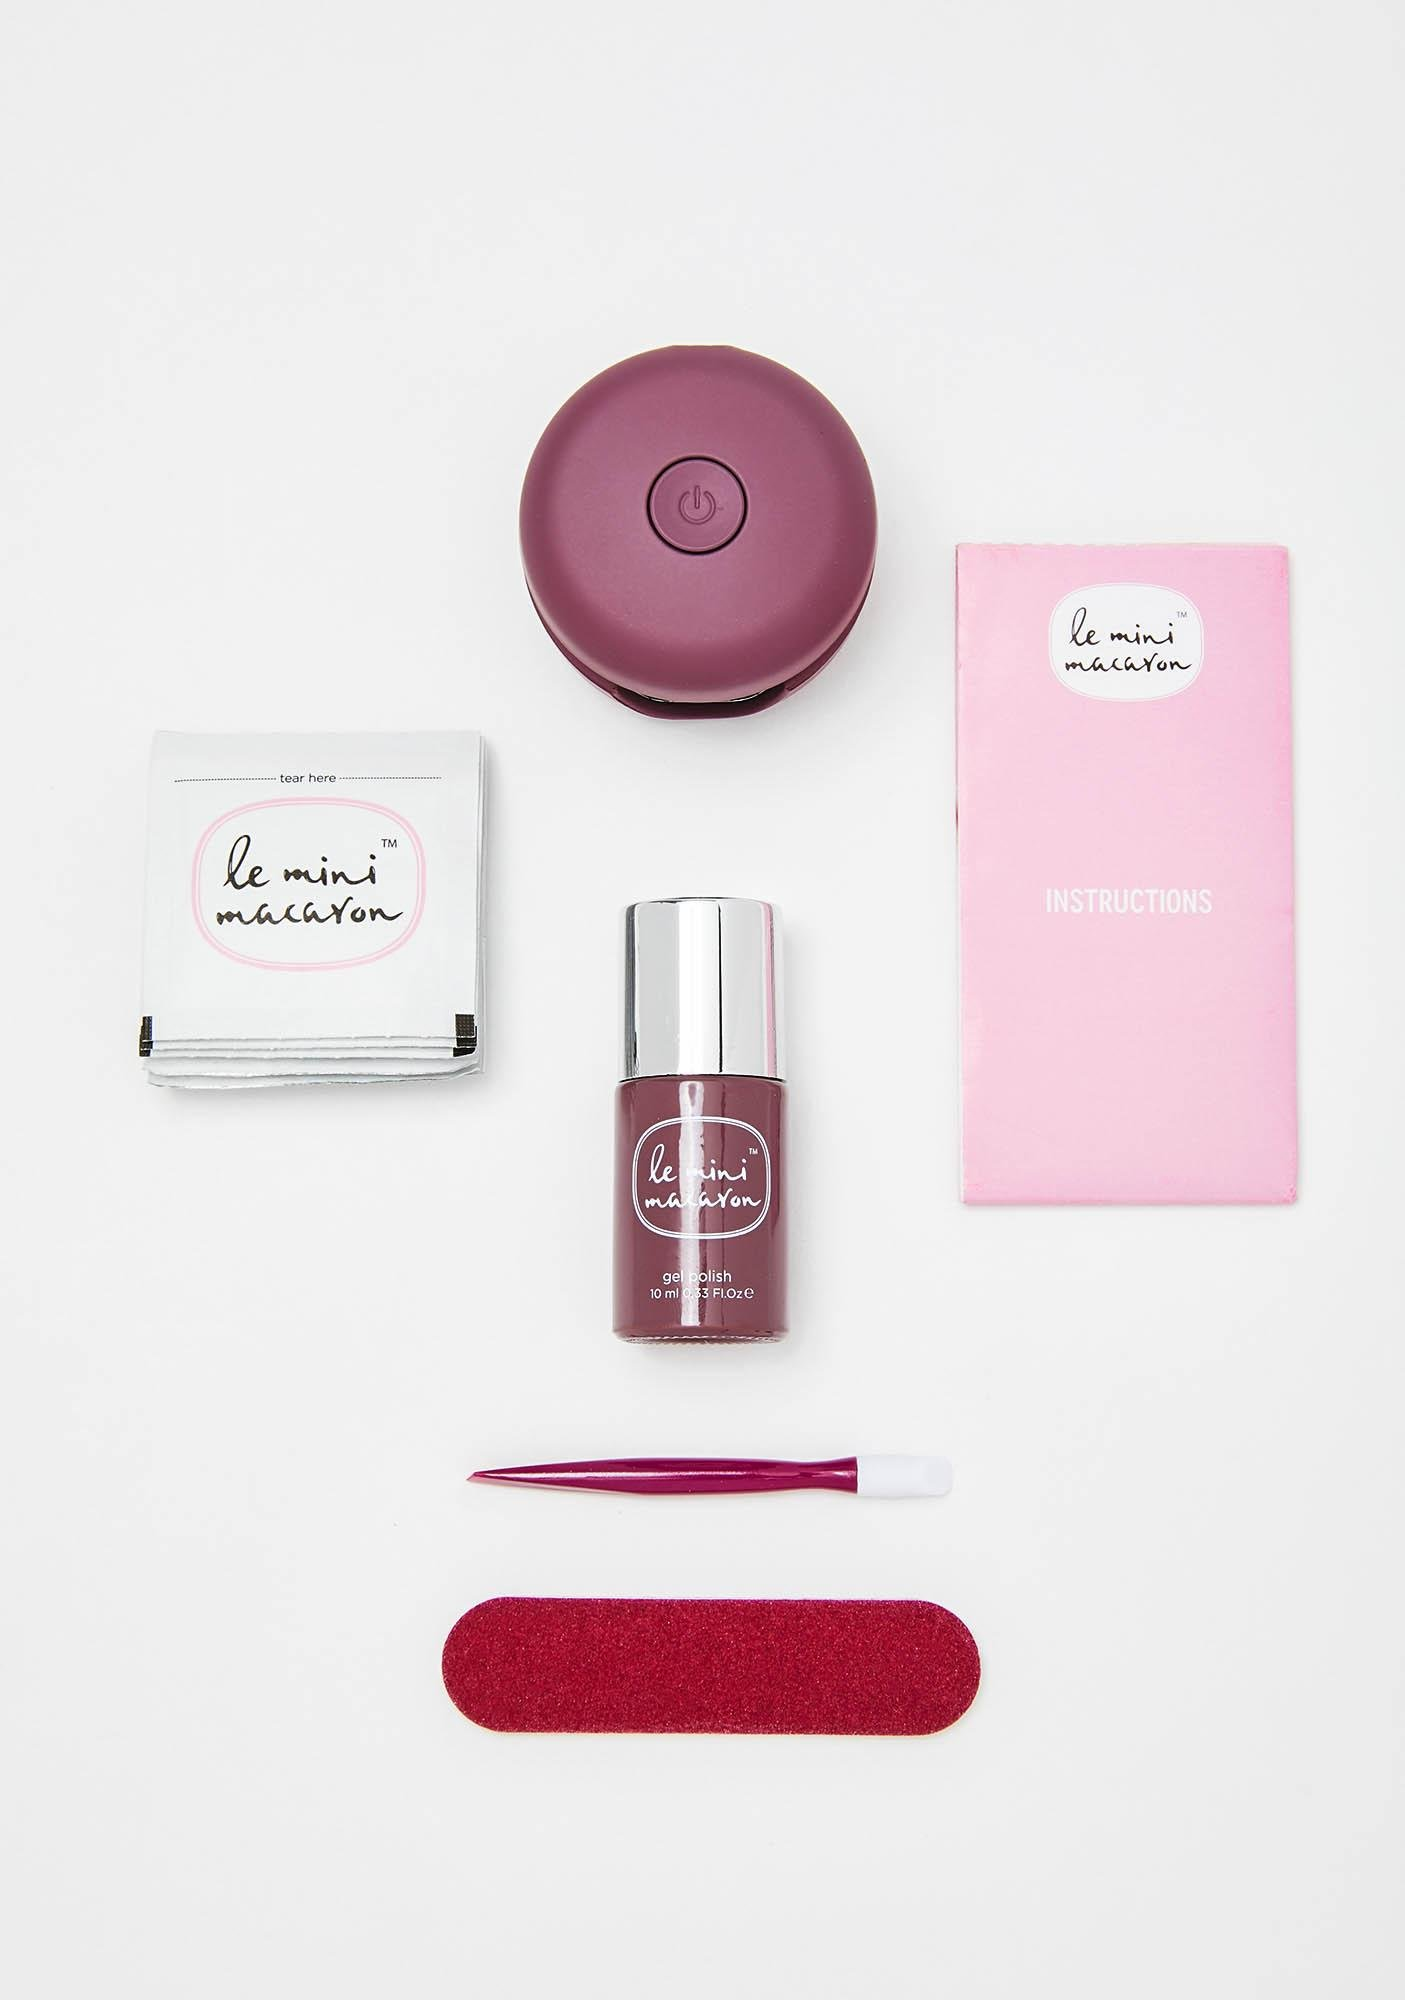 Le Mini Macaron Rum Raisin Gel Manicure Kit